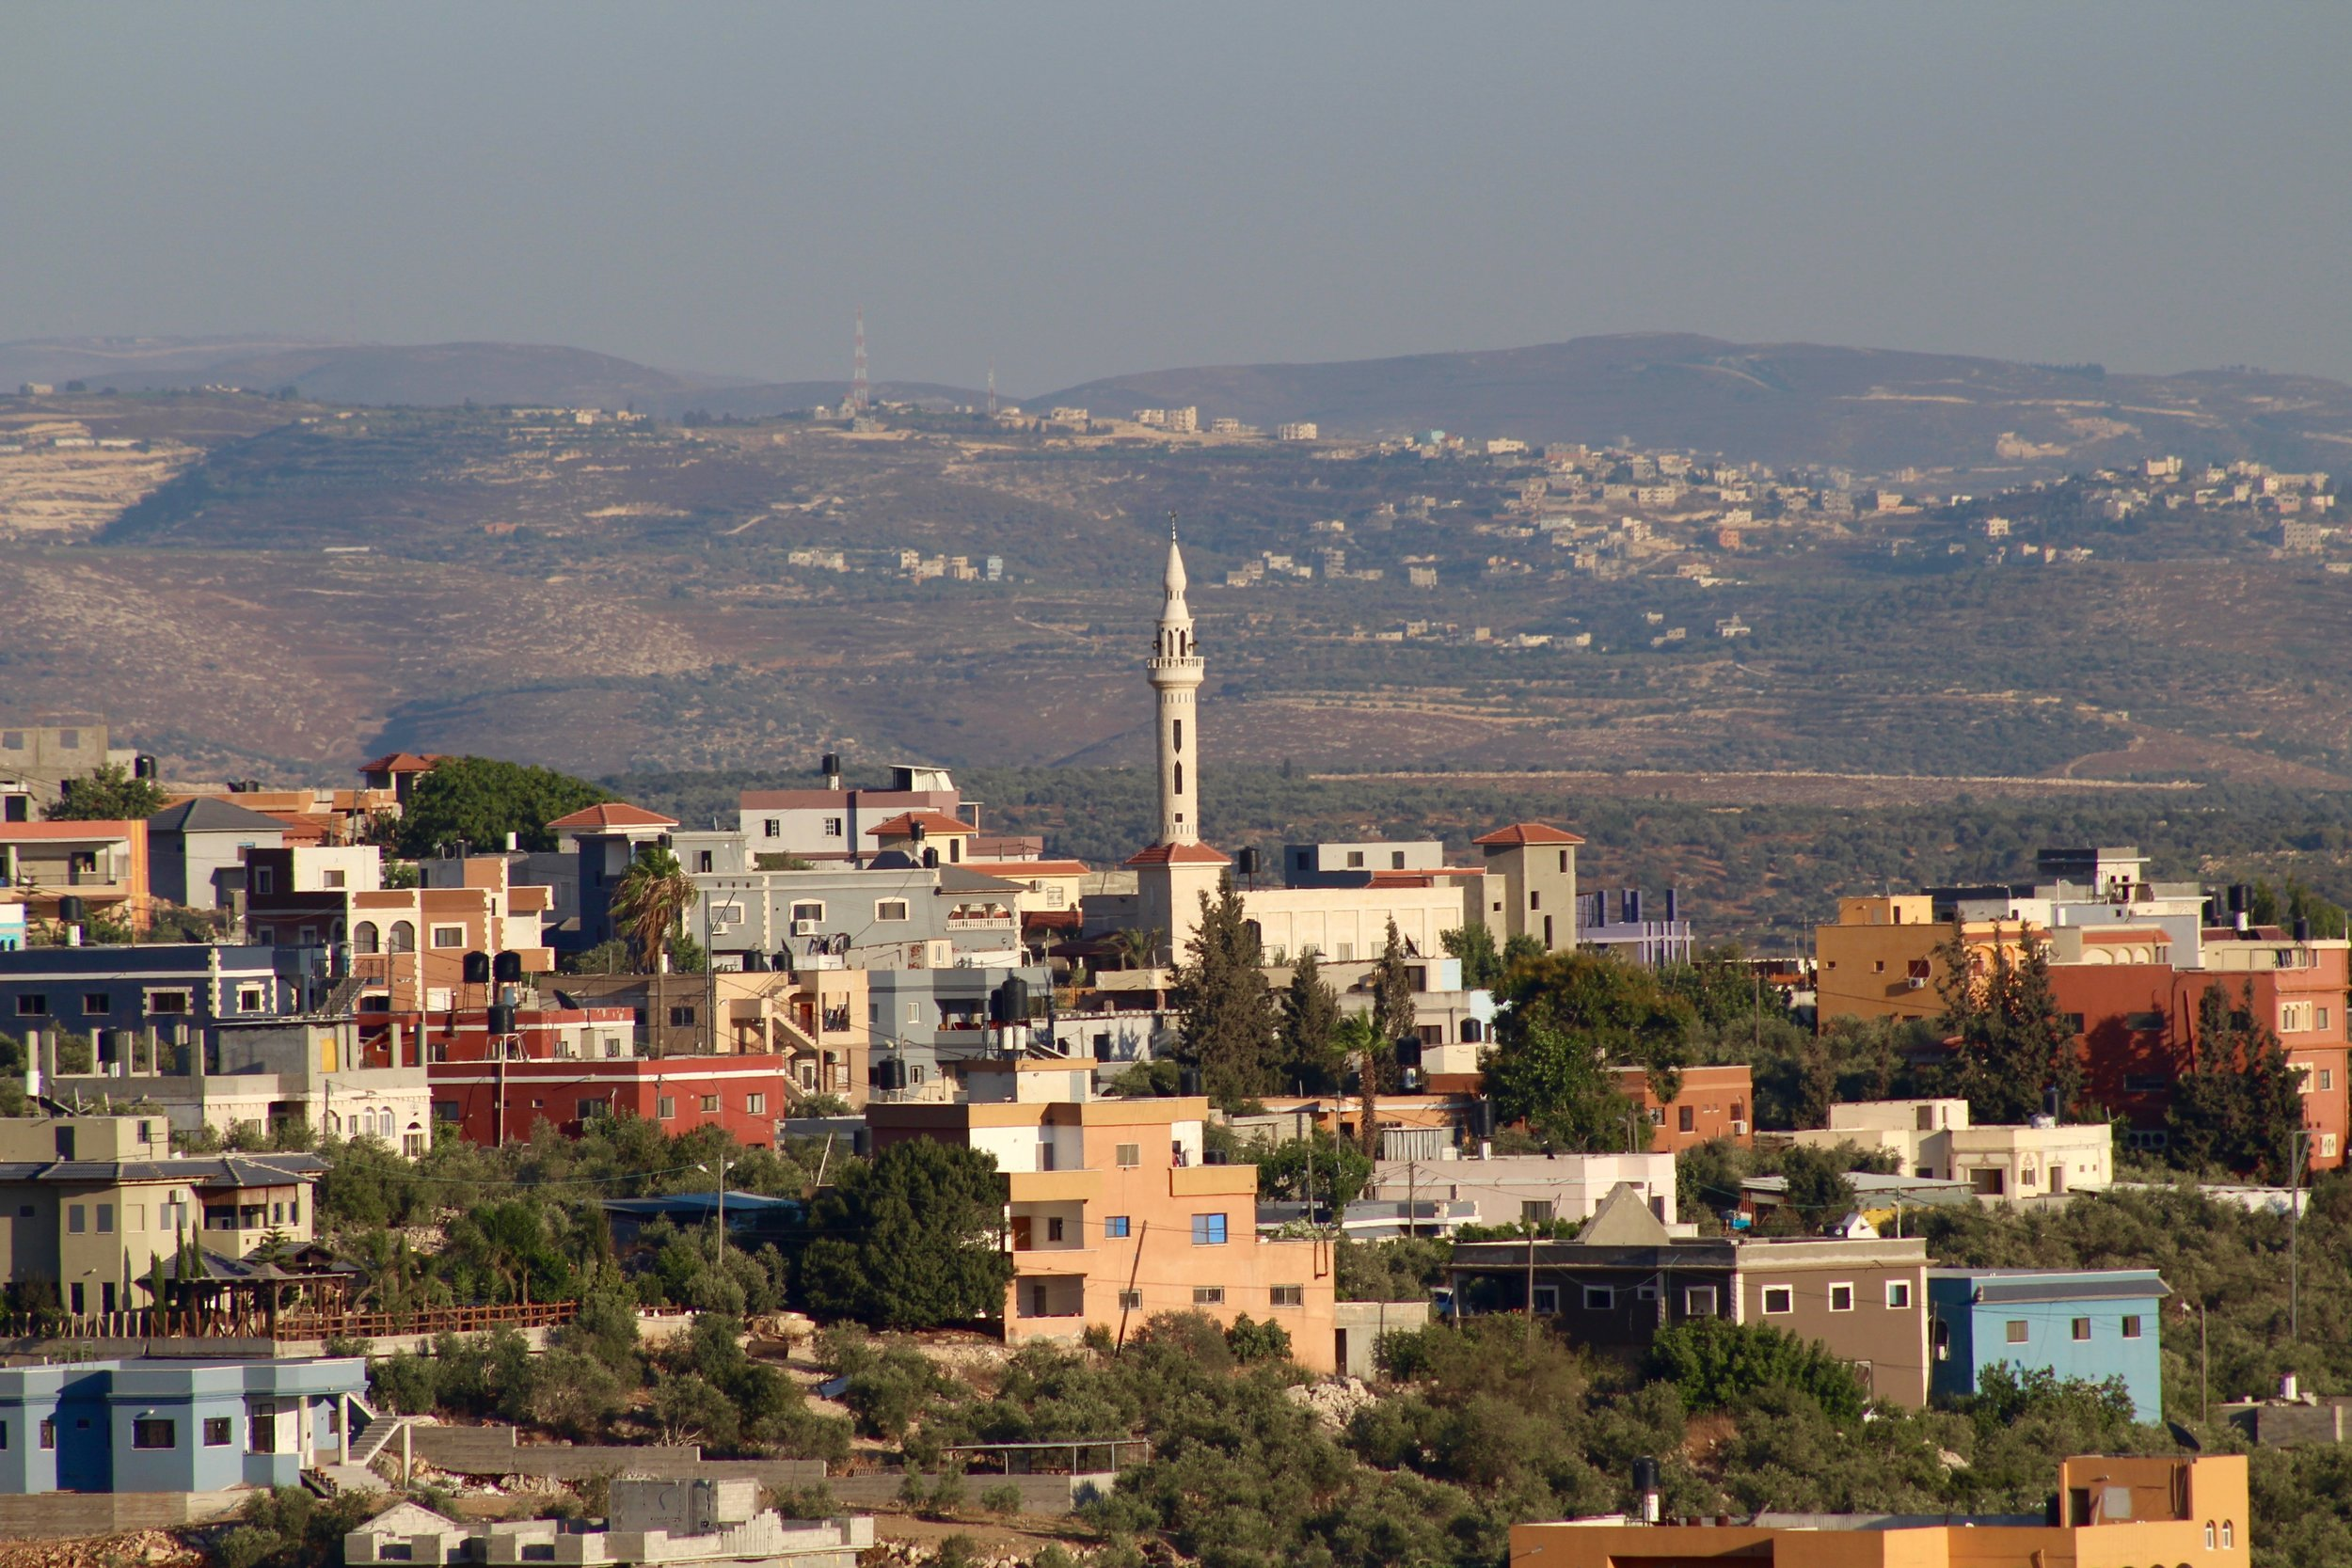 Arab village in the West Bank. Photo: Jason Harris